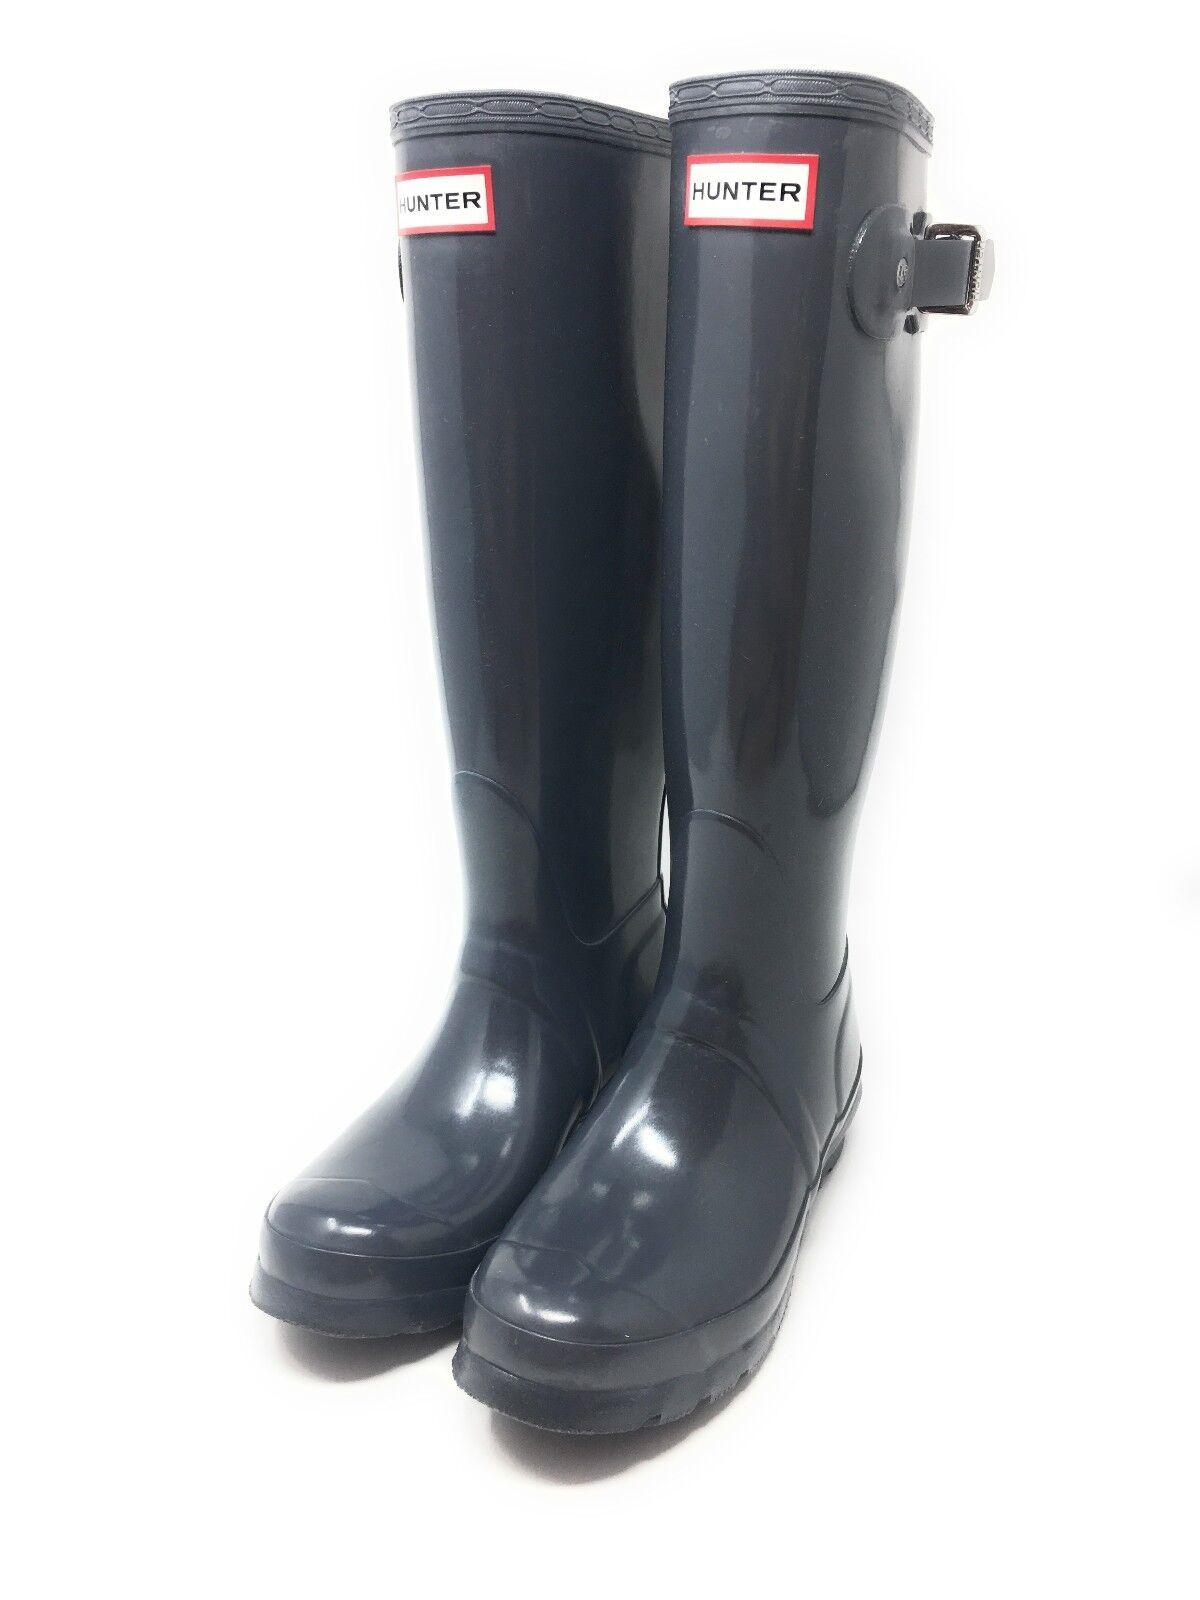 Hunter Original Tall Gloss W23616, Damen Damen Damen Gummistiefel grau Gr. 37 NEU Stiefel 523a30